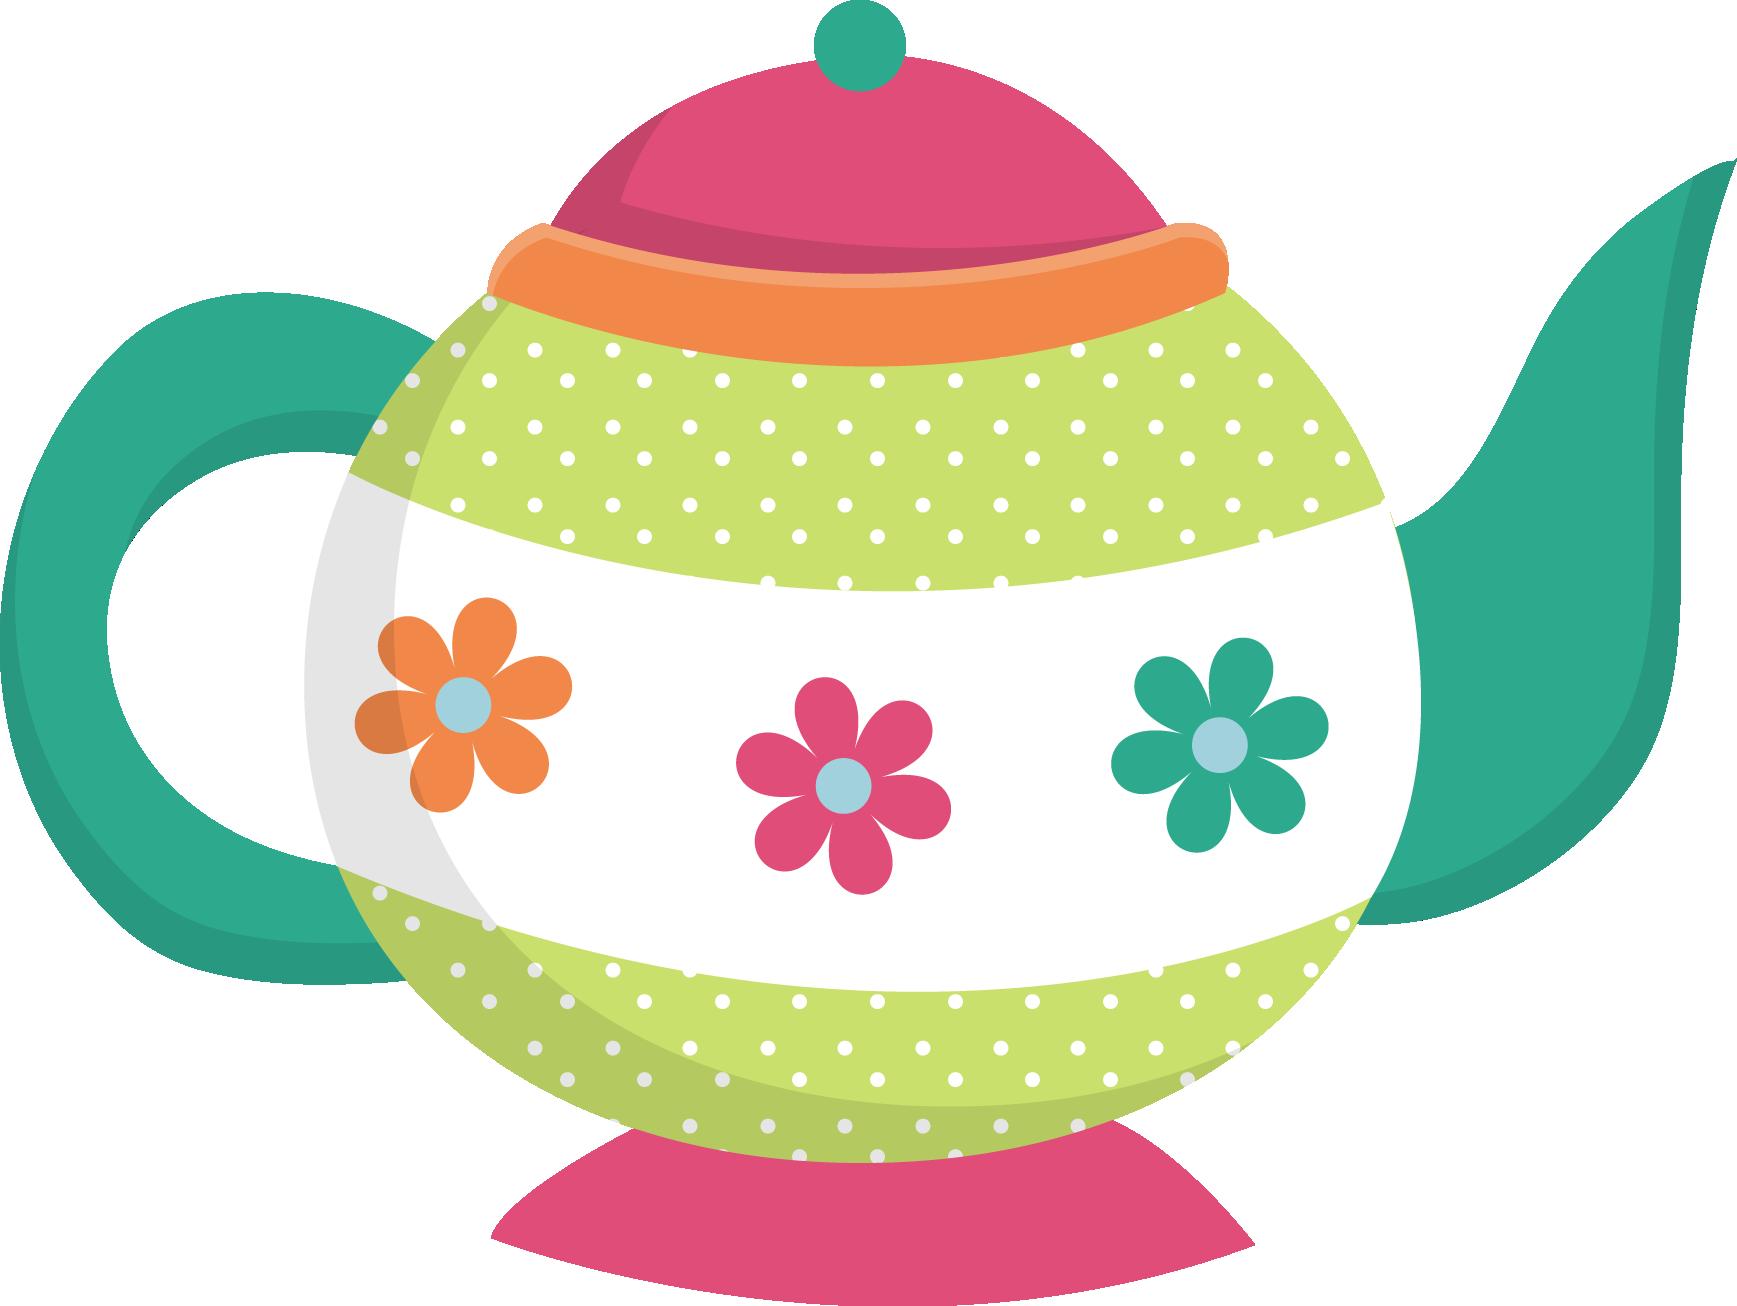 Teapot flower pot clipart png black and white download Pin by Jen Alexander on Tea pots | Tea pots, Clip art ... png black and white download